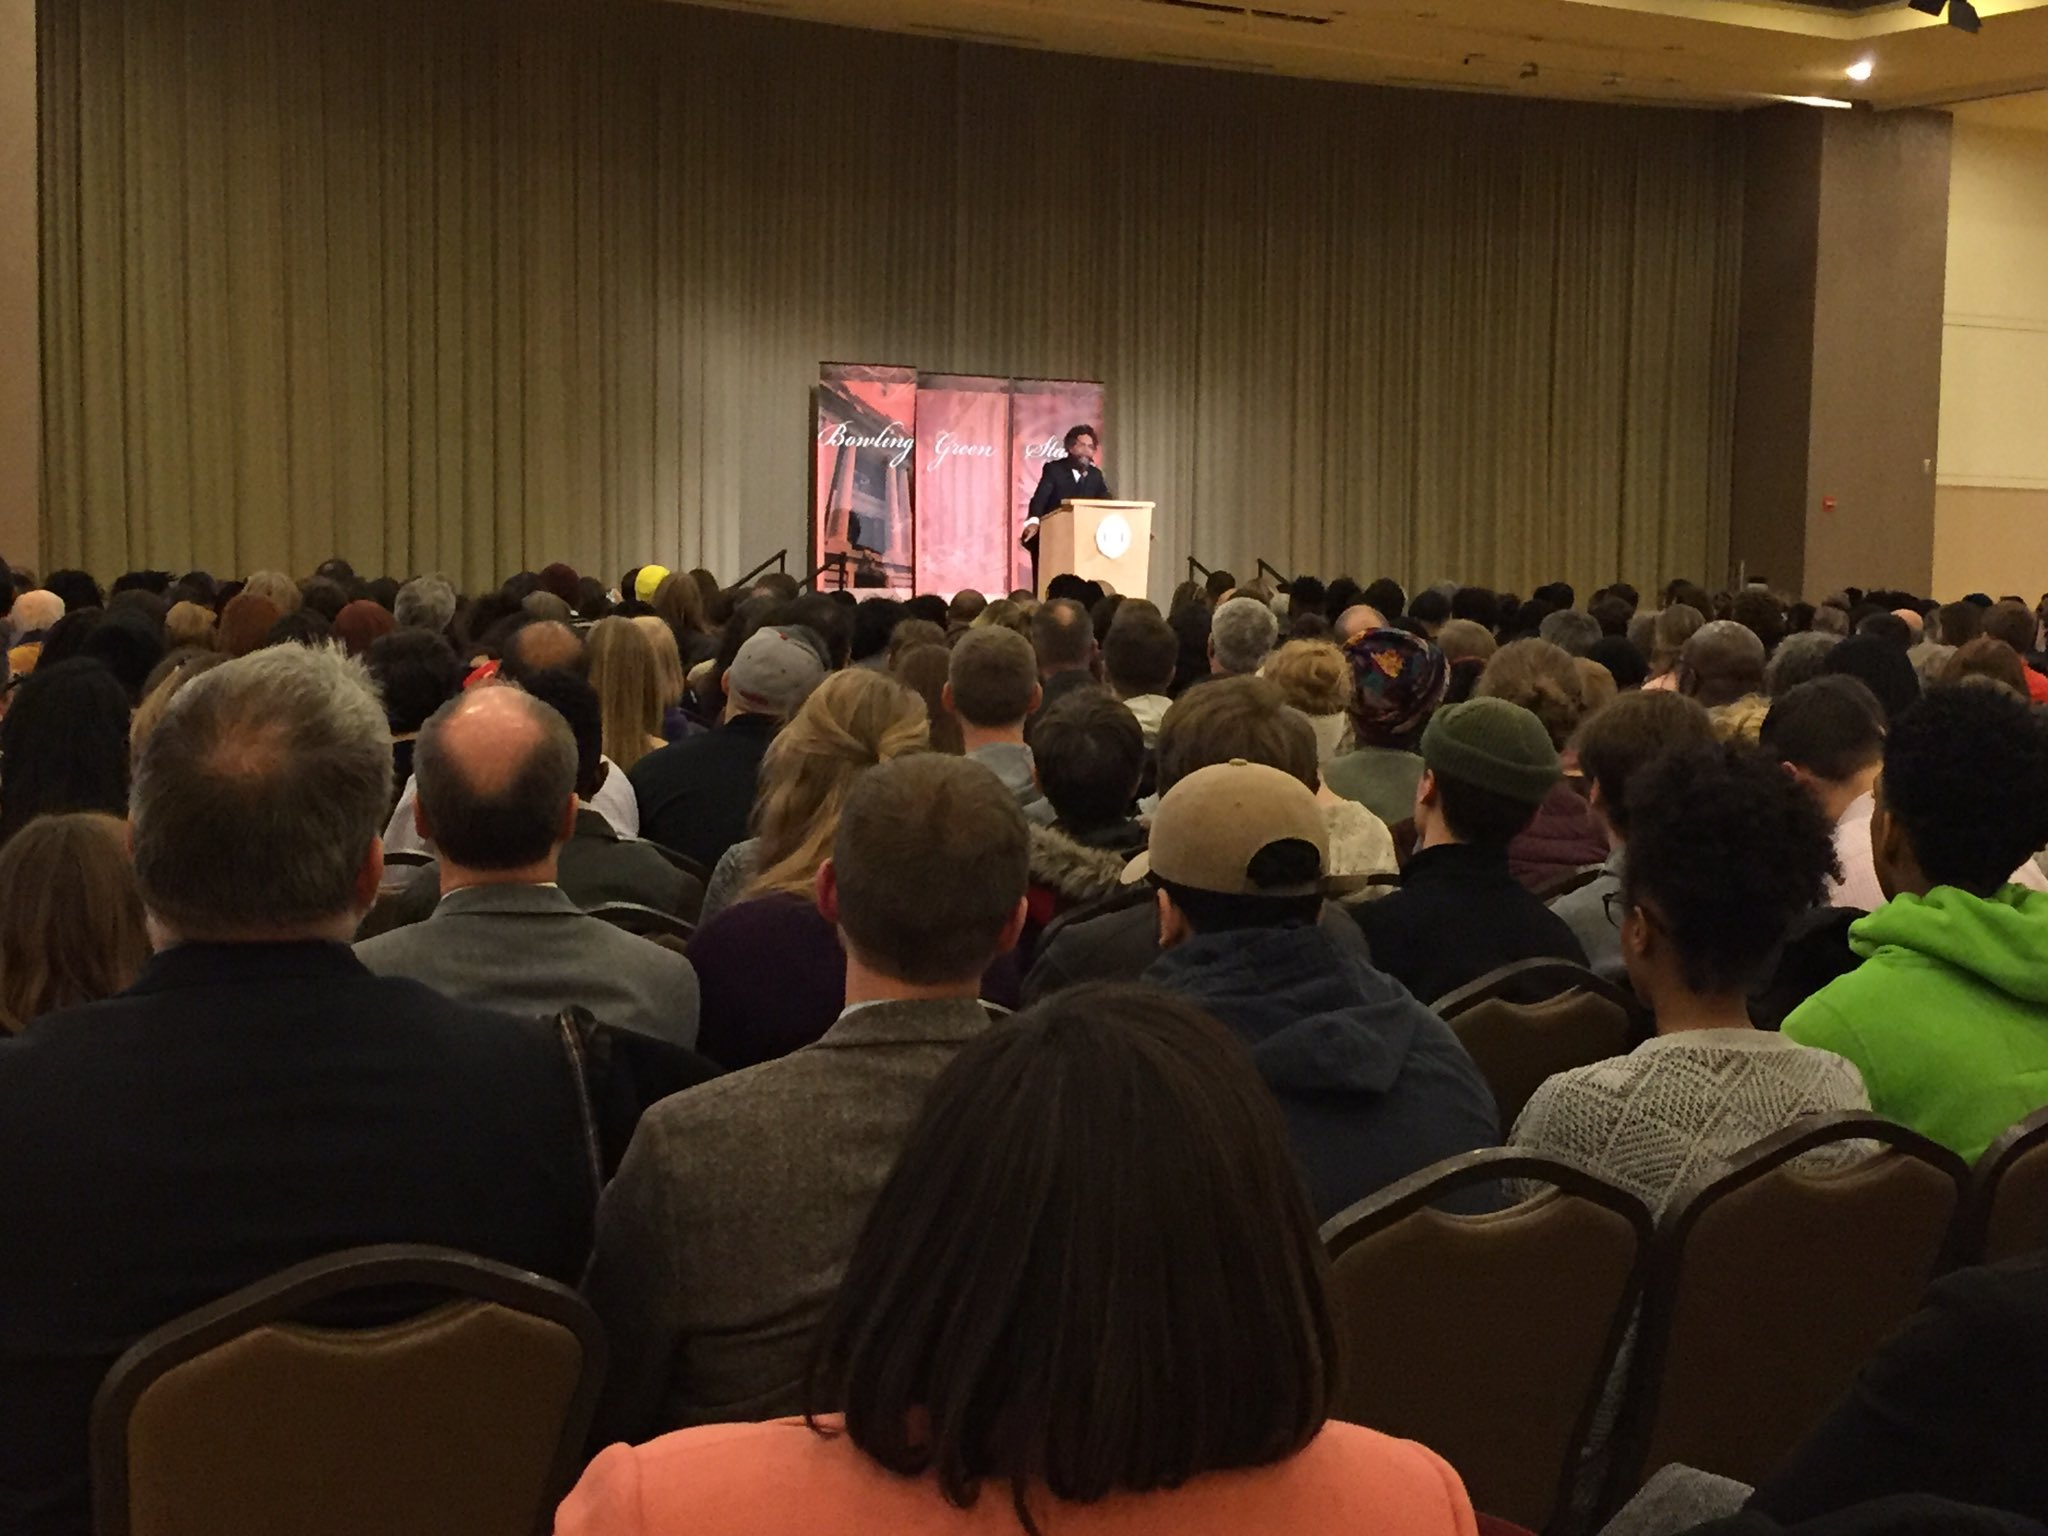 Dr. Cornel West - BGSU Martin Luther King presentation. https://t.co/LUQyAyp7Tt